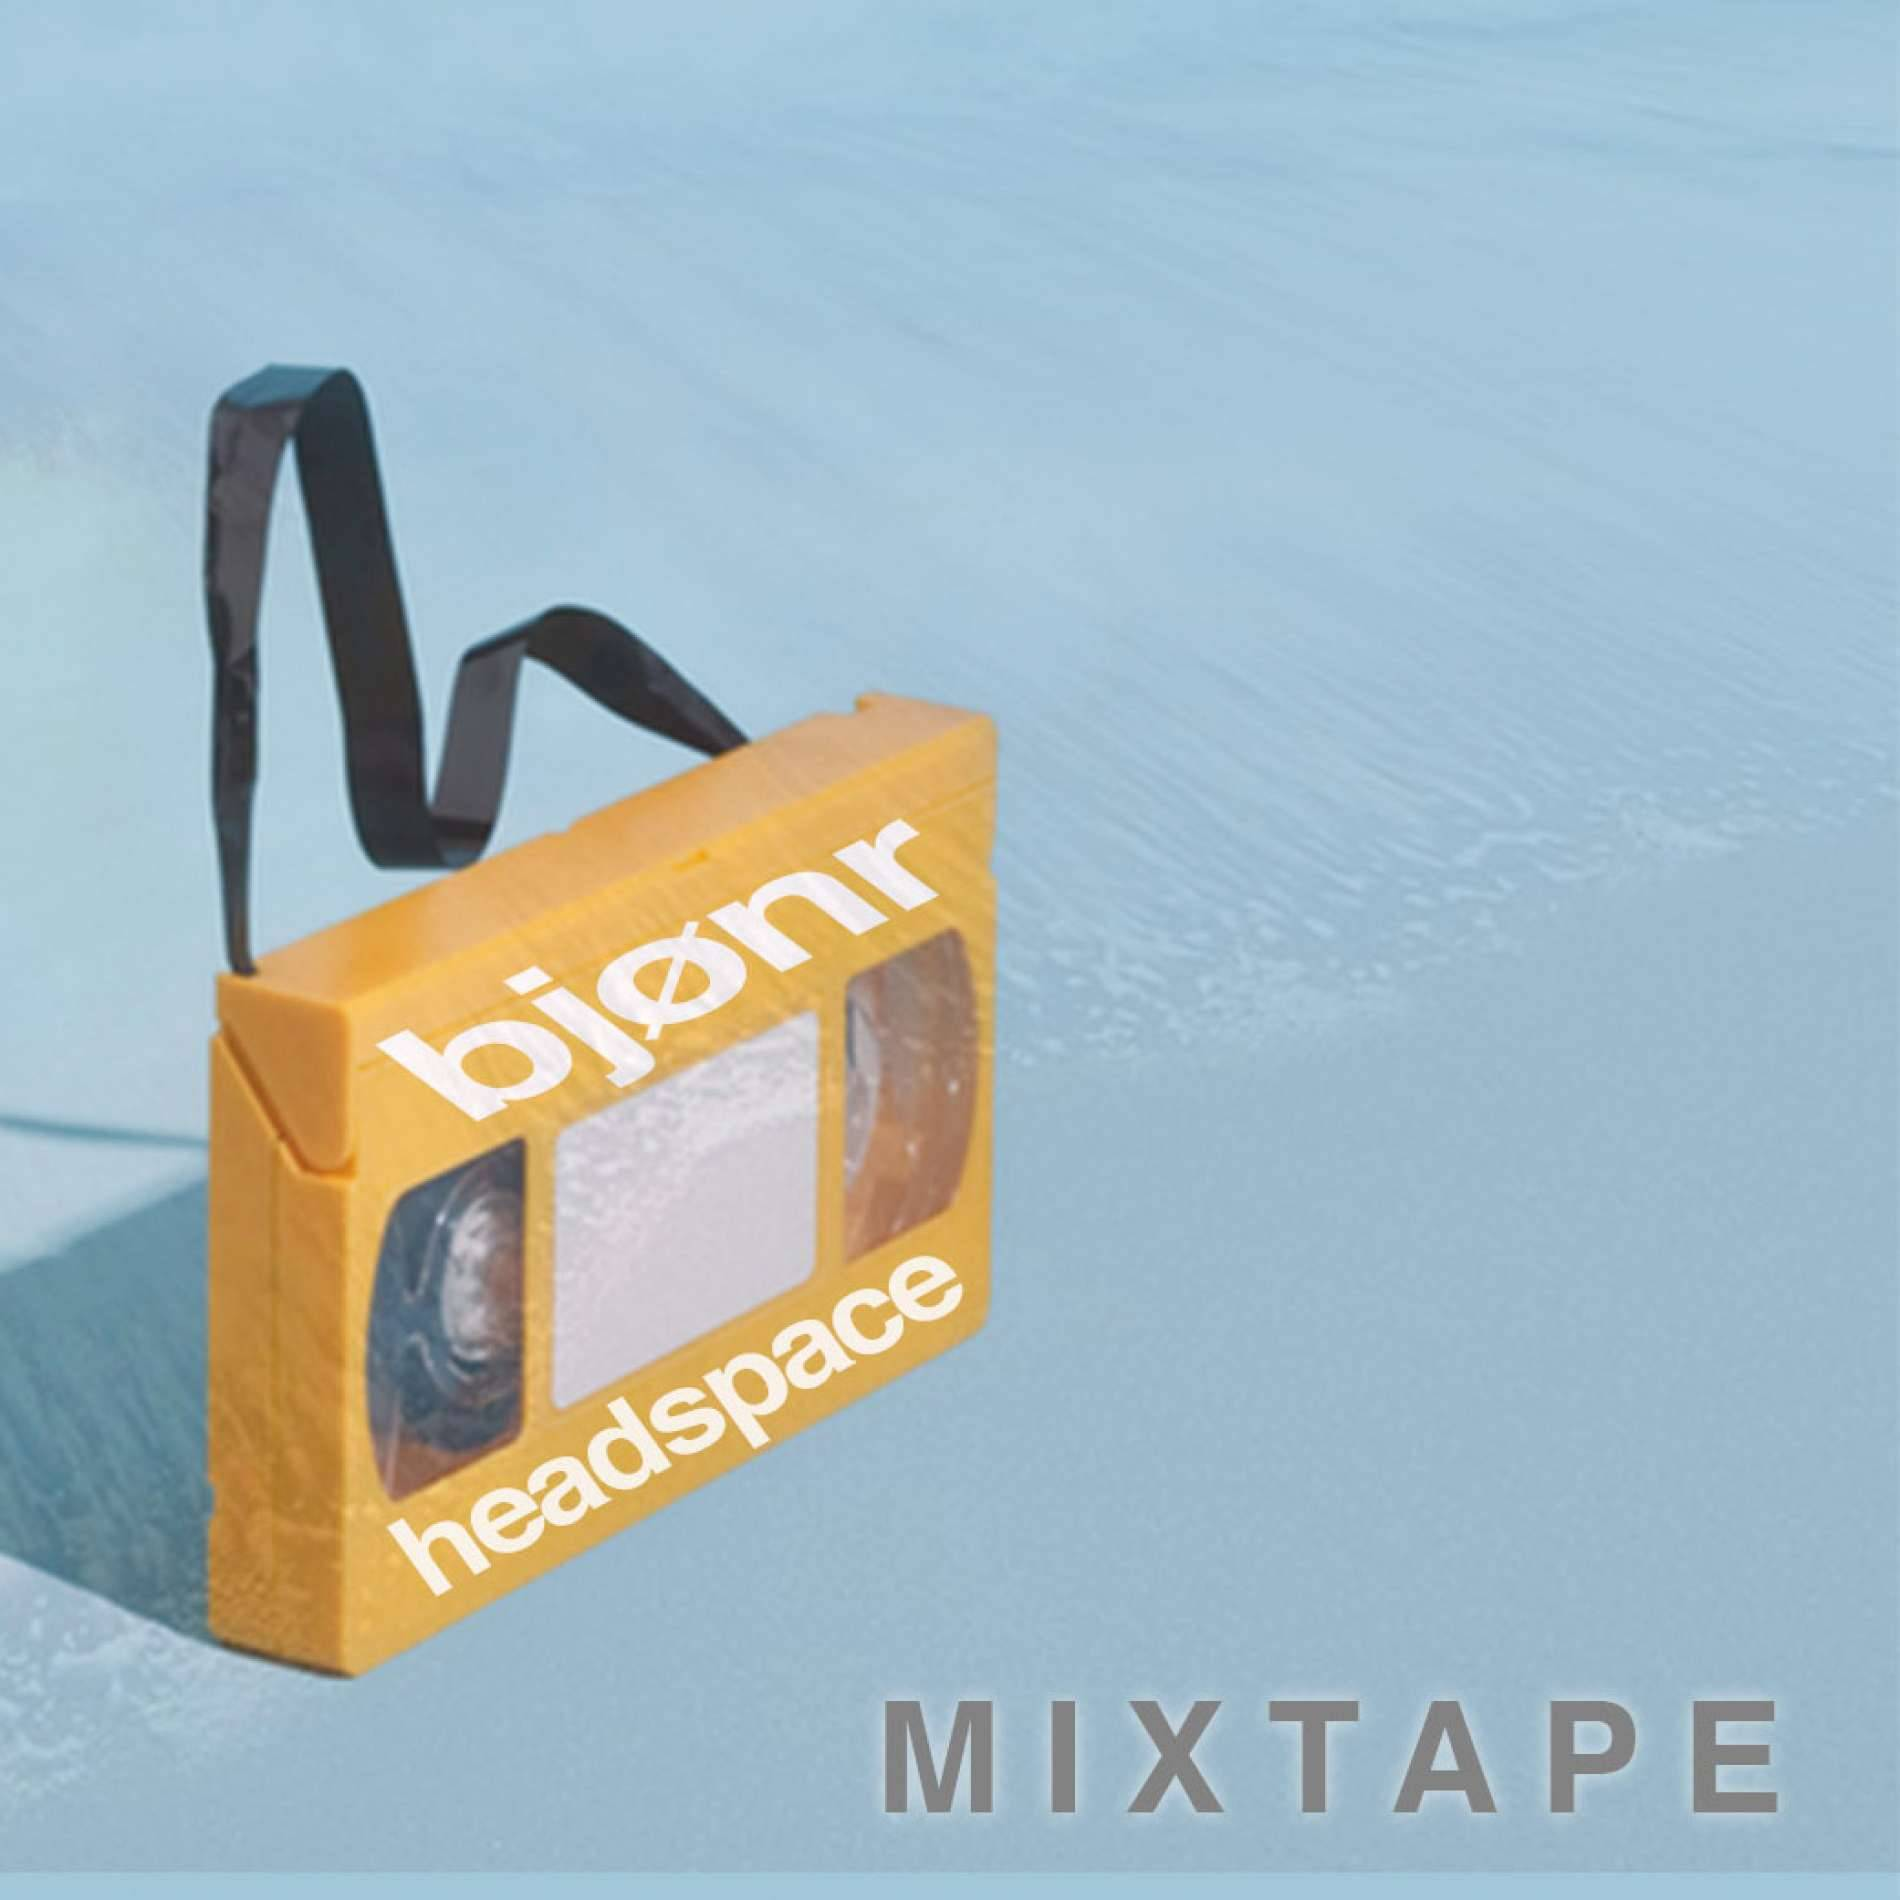 Check out this killer mixtape by Bjonr